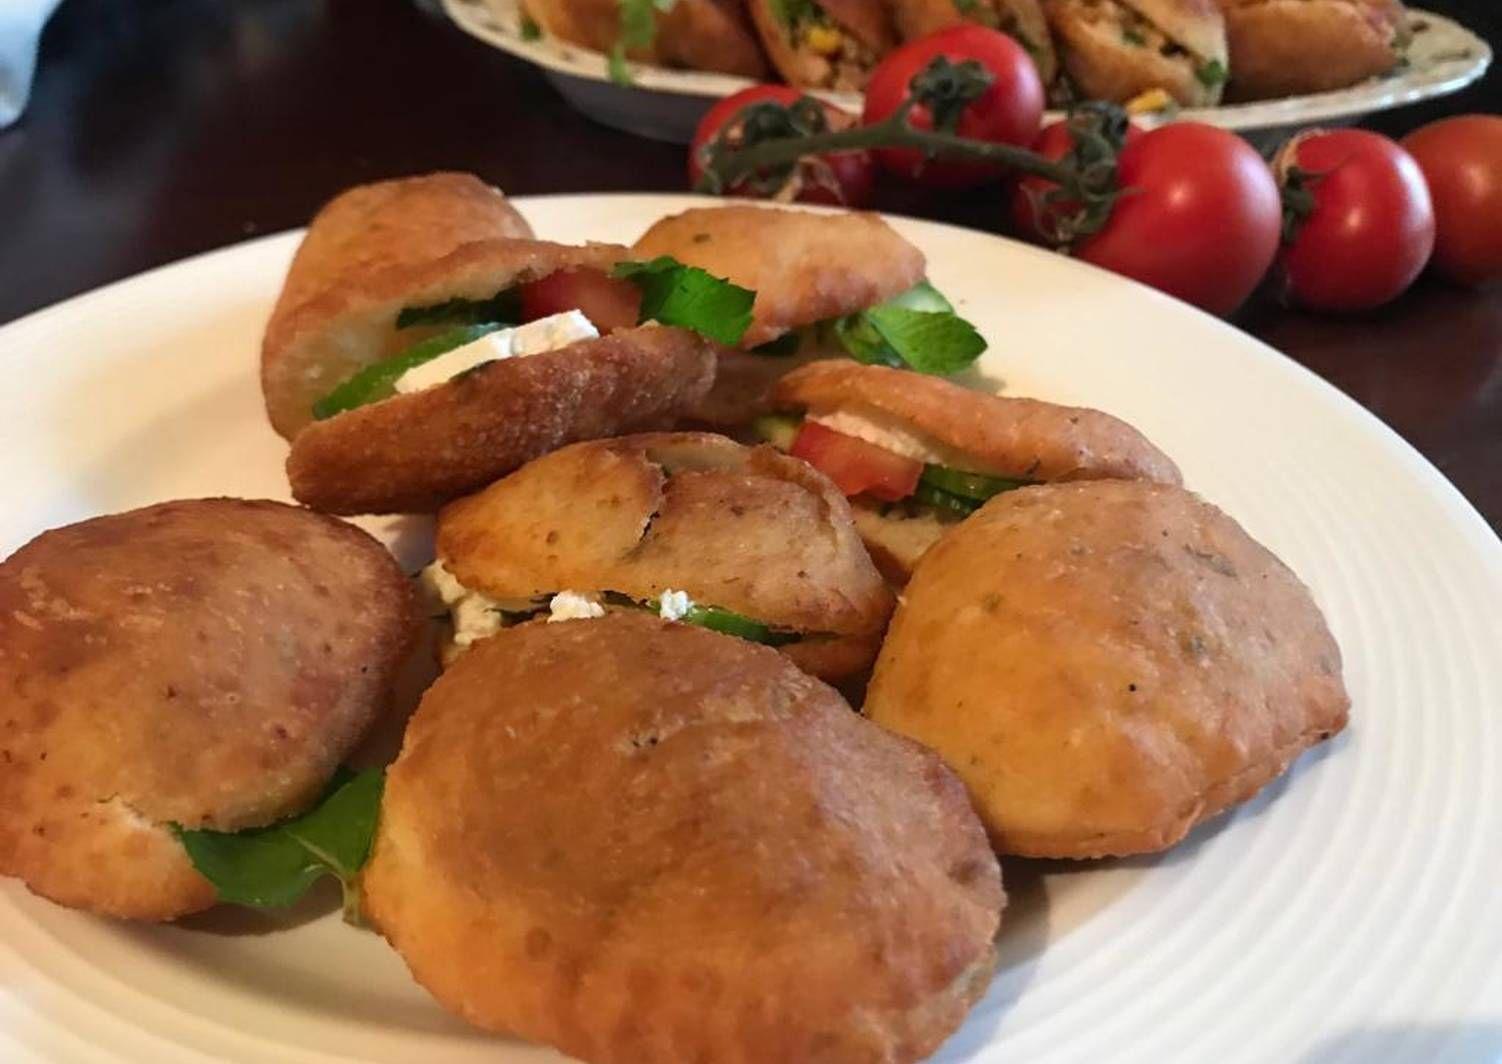 جيب التاجر بالجبنة بالصور من Hiam Saleh Recipe Food Vegetables Potatoes